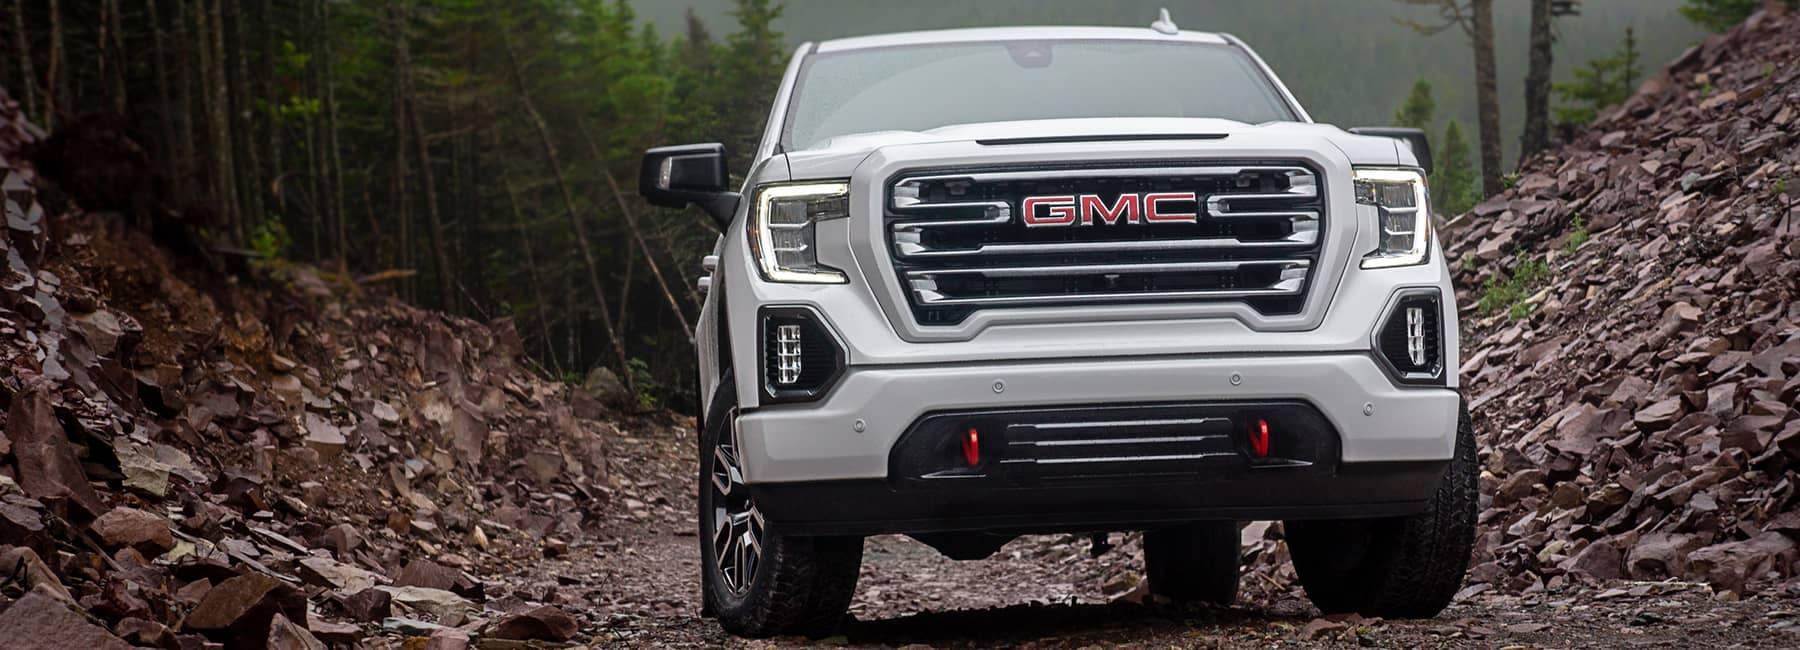 White 2020 GMC Sierra 1500 Front